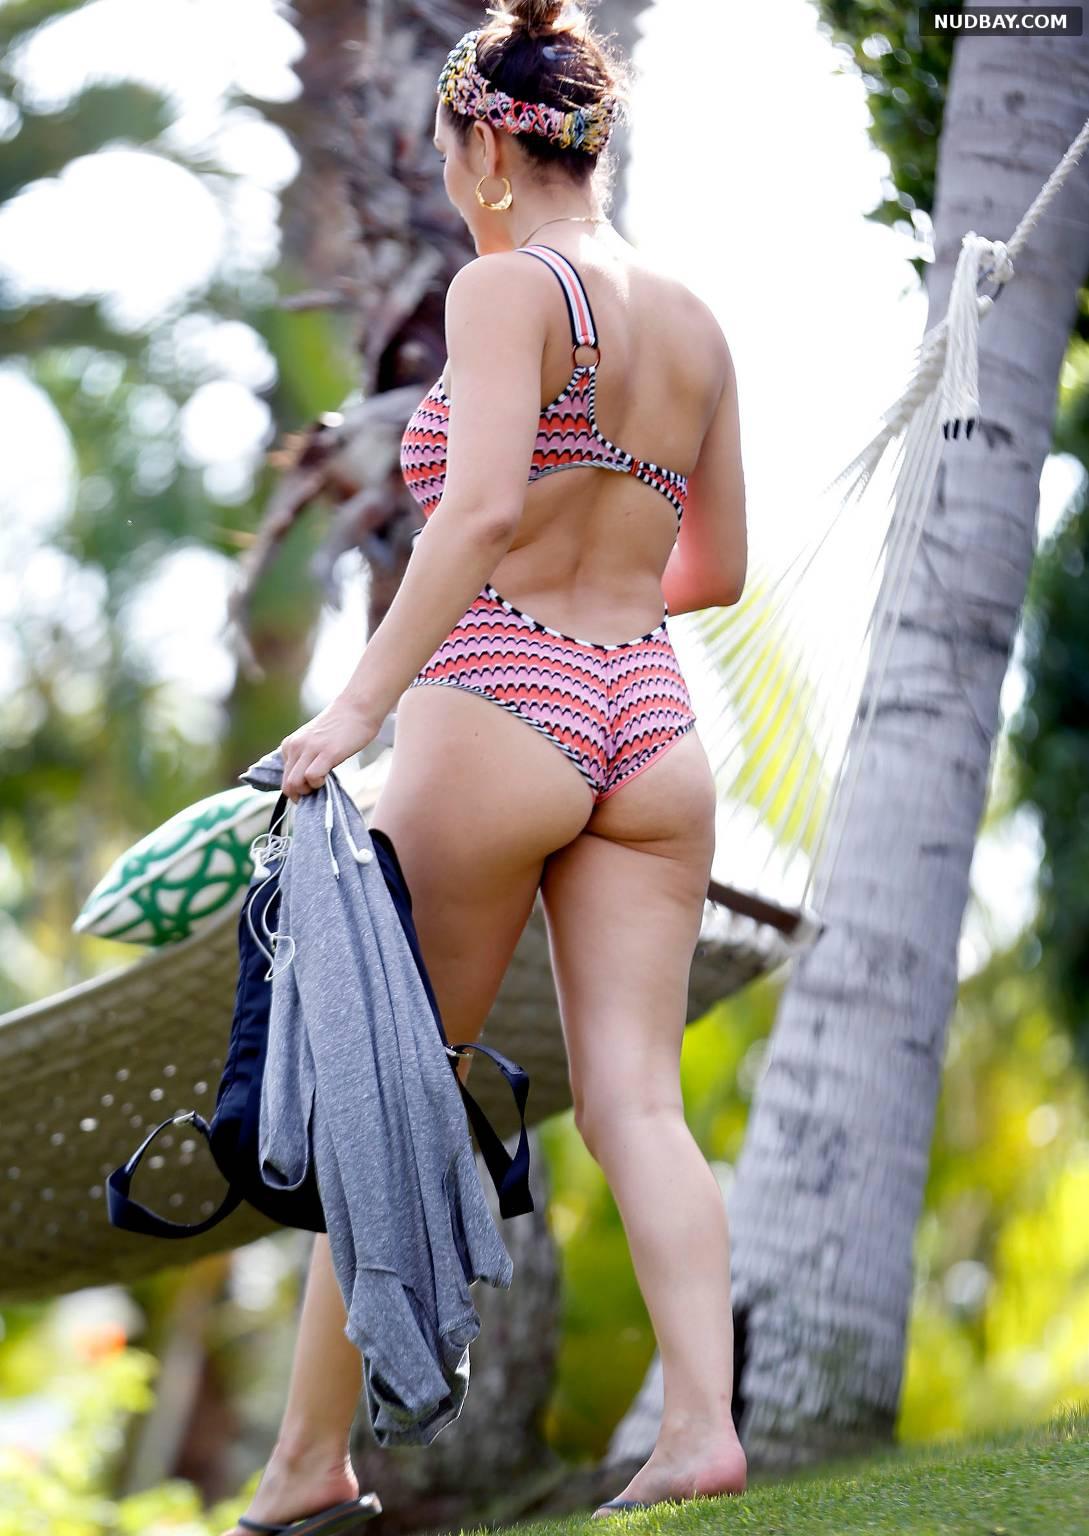 Katharine McPhee Ass Wearing a Swimsuit in Hawaii Jan 18 2018